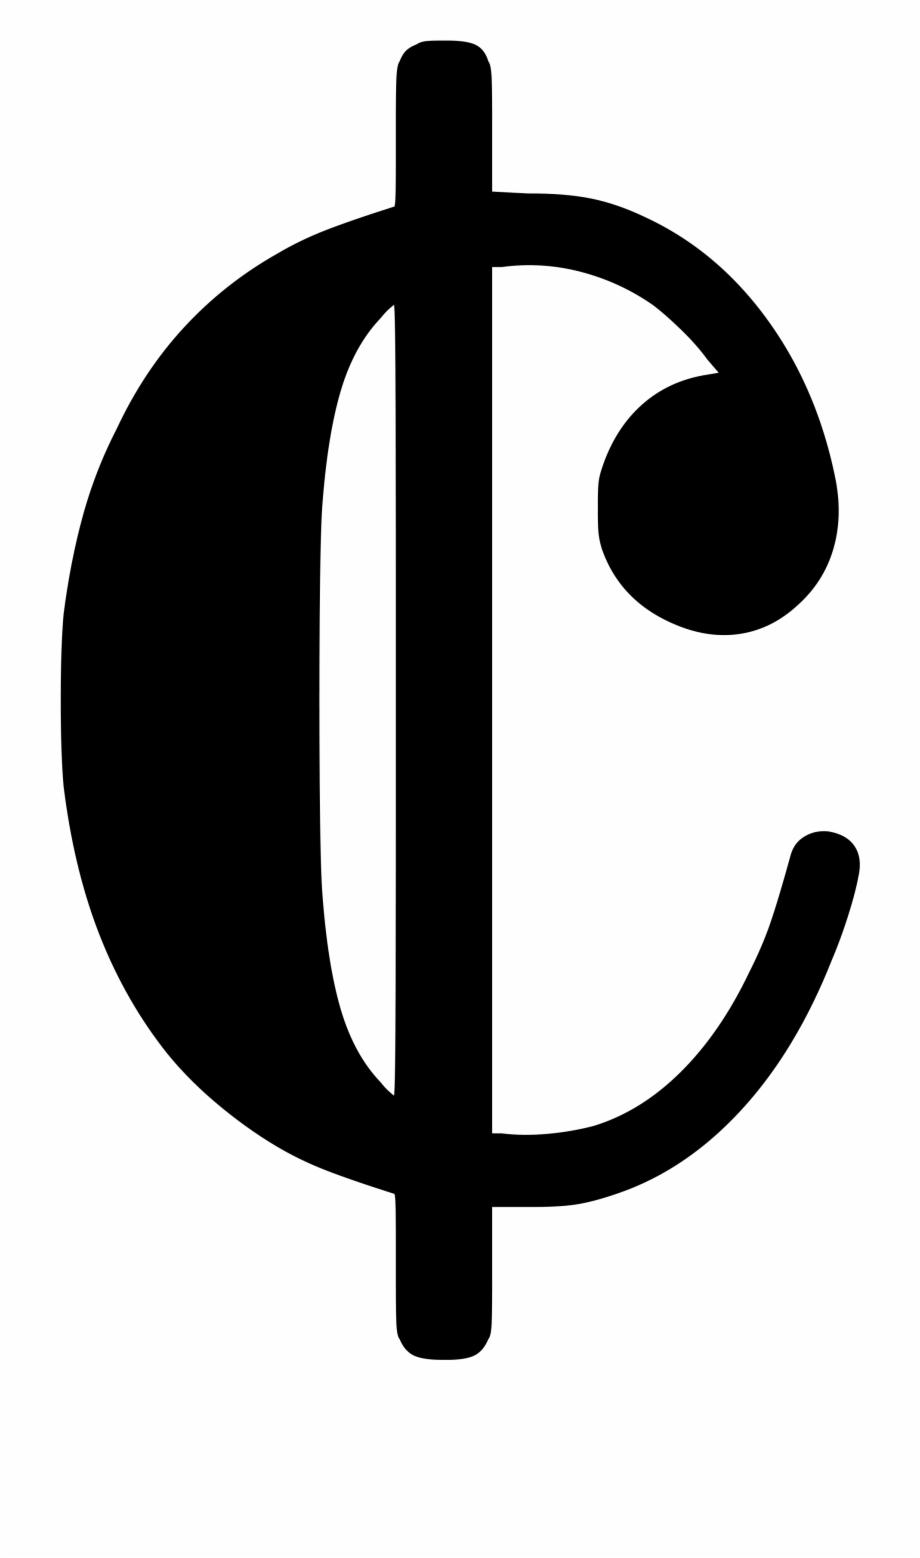 Cents Symbol Png 25 Cents Clipart.